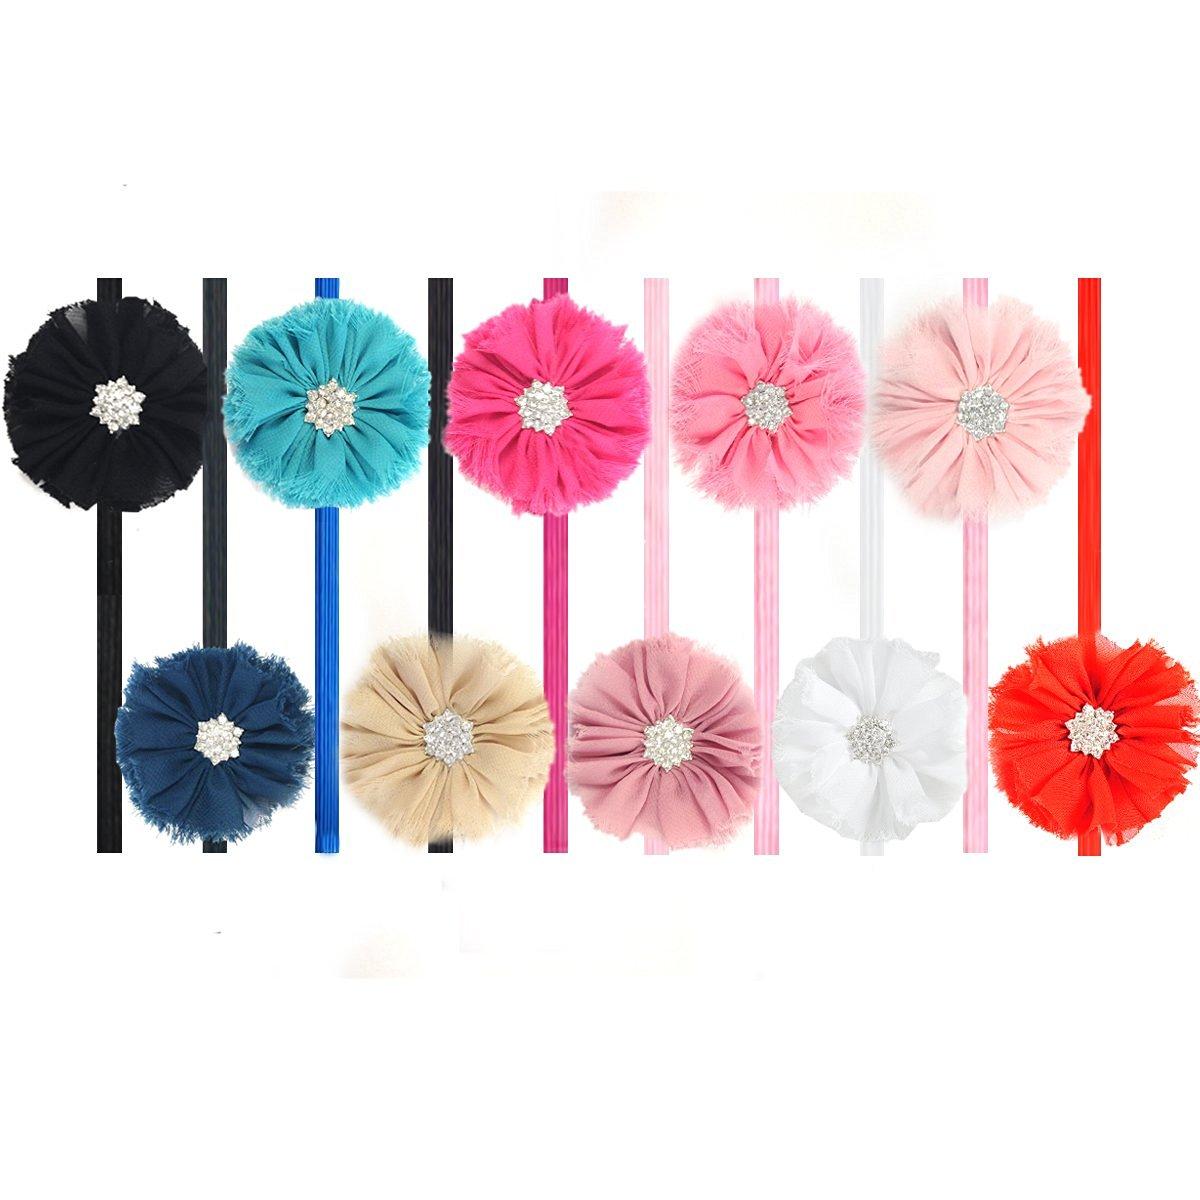 Kella Milla Set of 10 Chiffon Flower Headbands for Baby and Toddler Girls